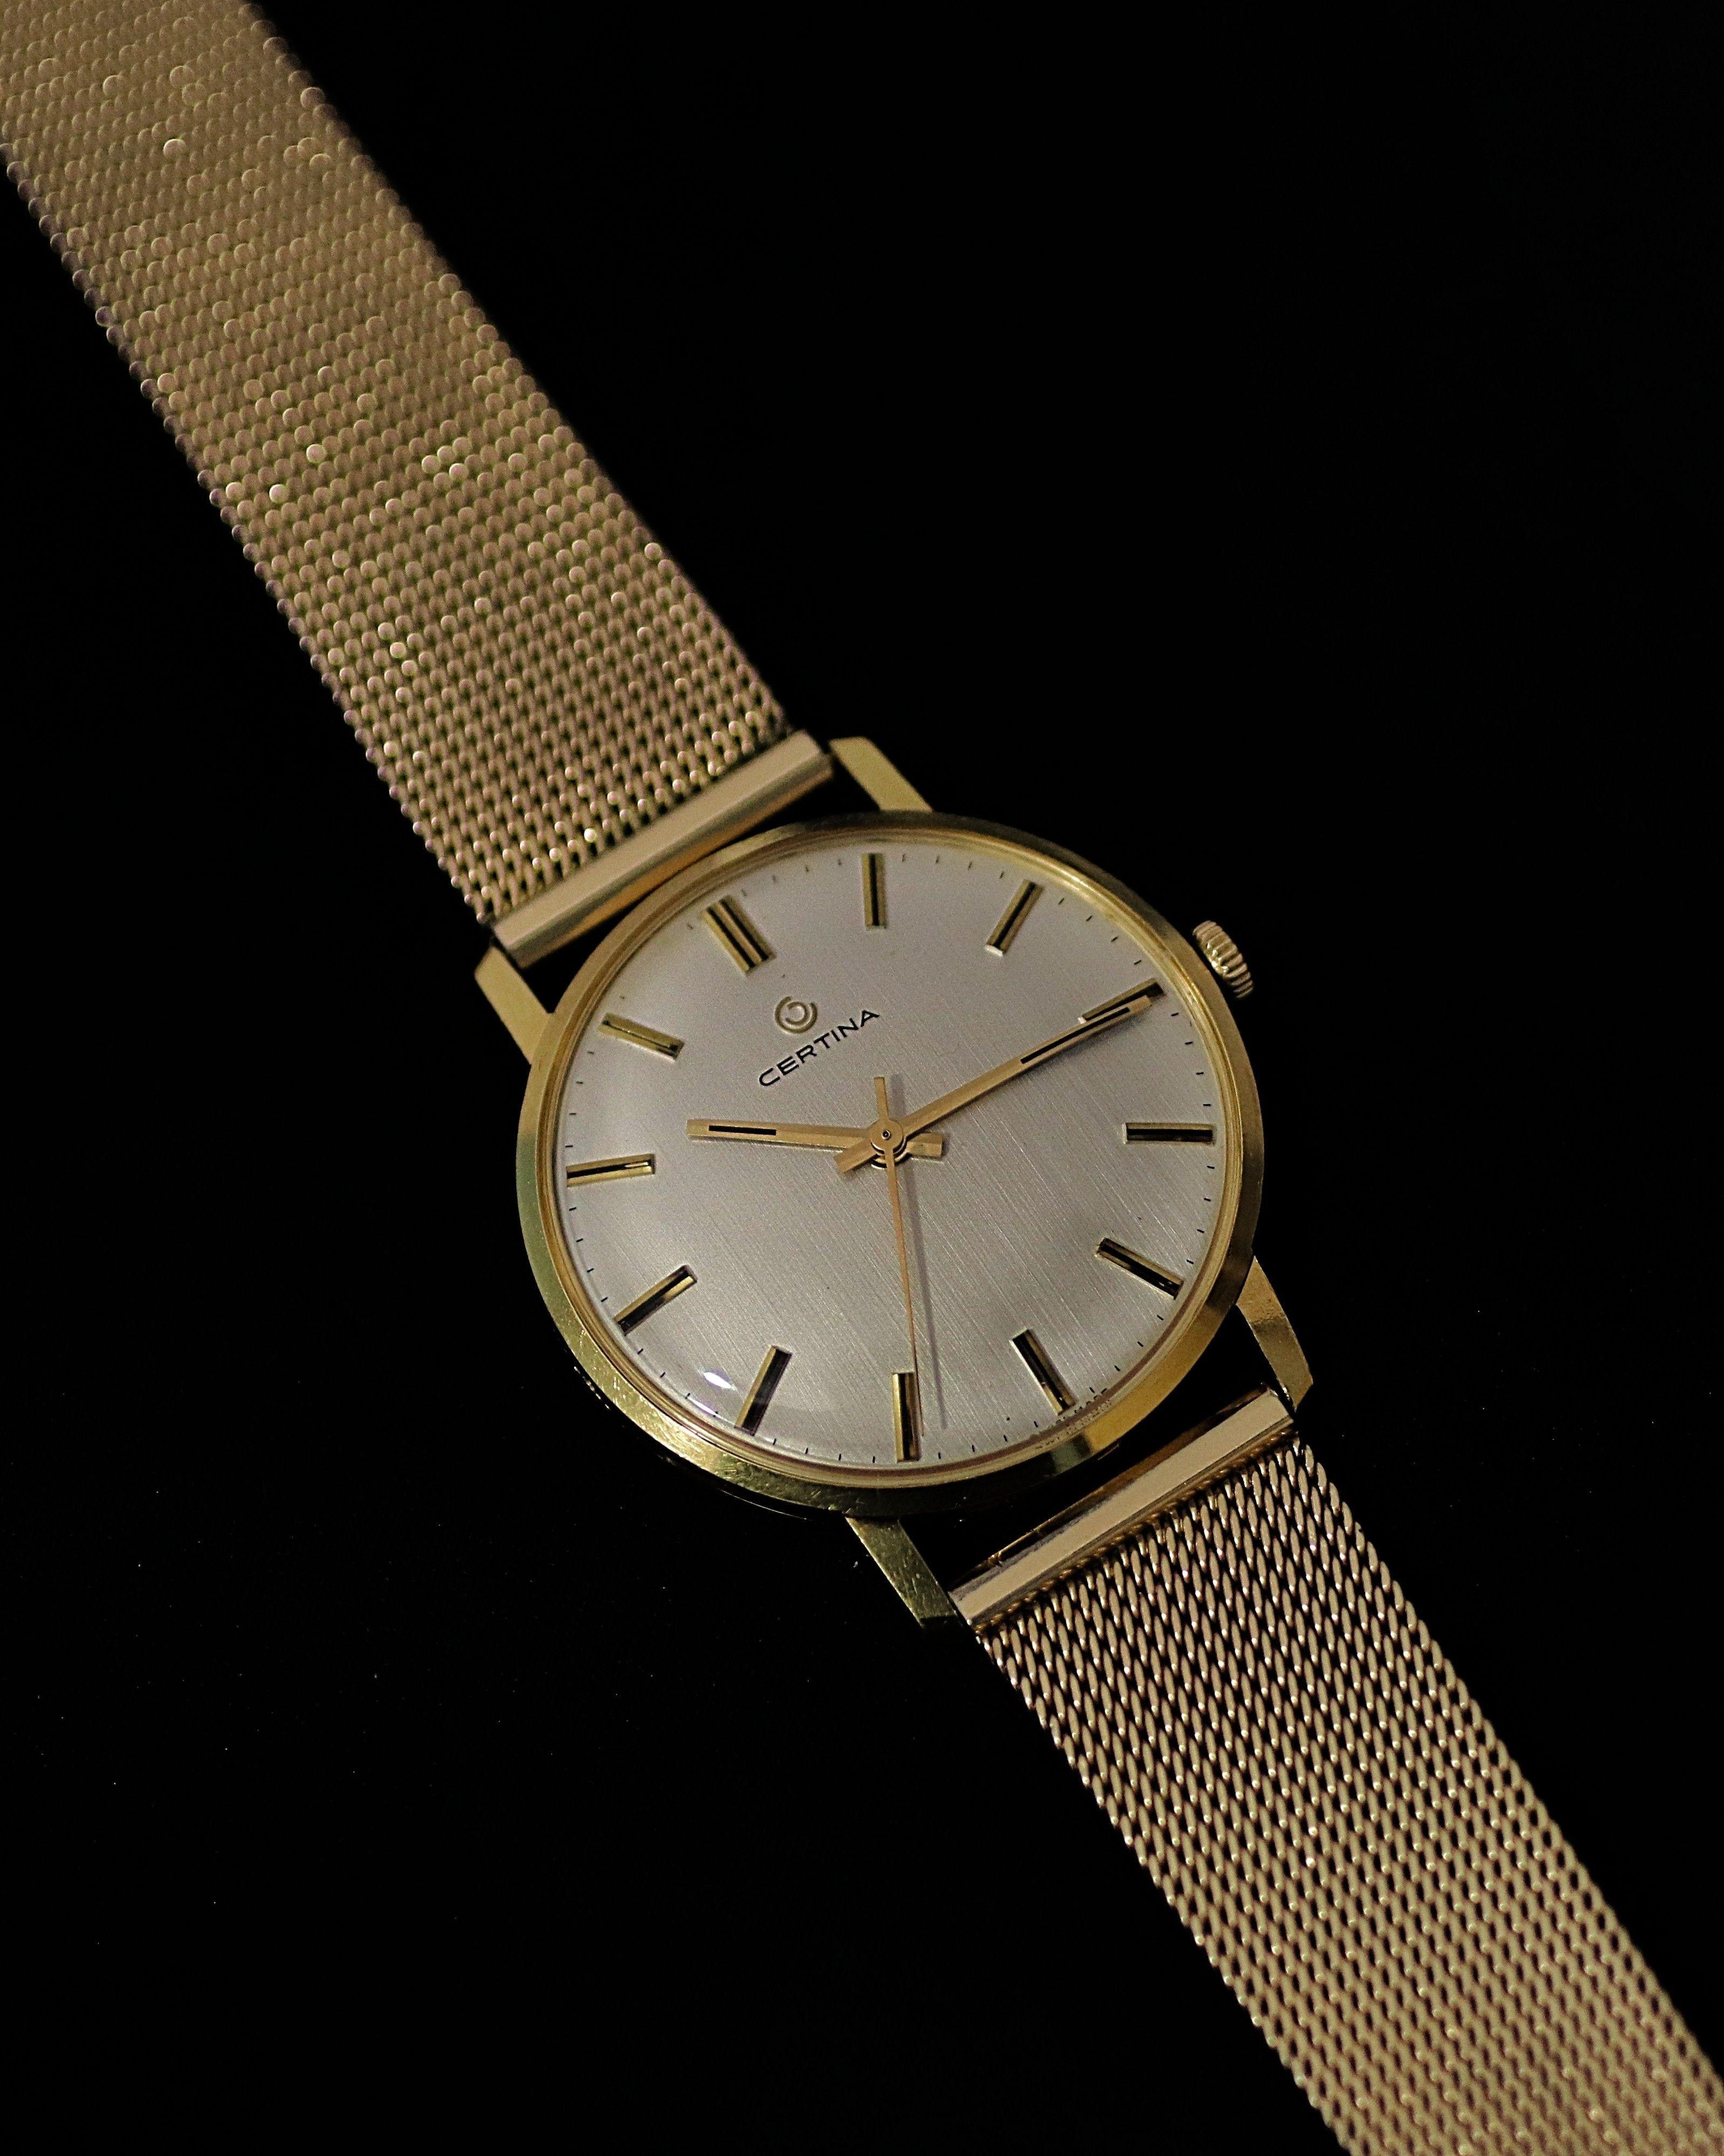 La PulseraOro De Precioso Certina Suizo 18k Marca Reloj yON8mnwv0